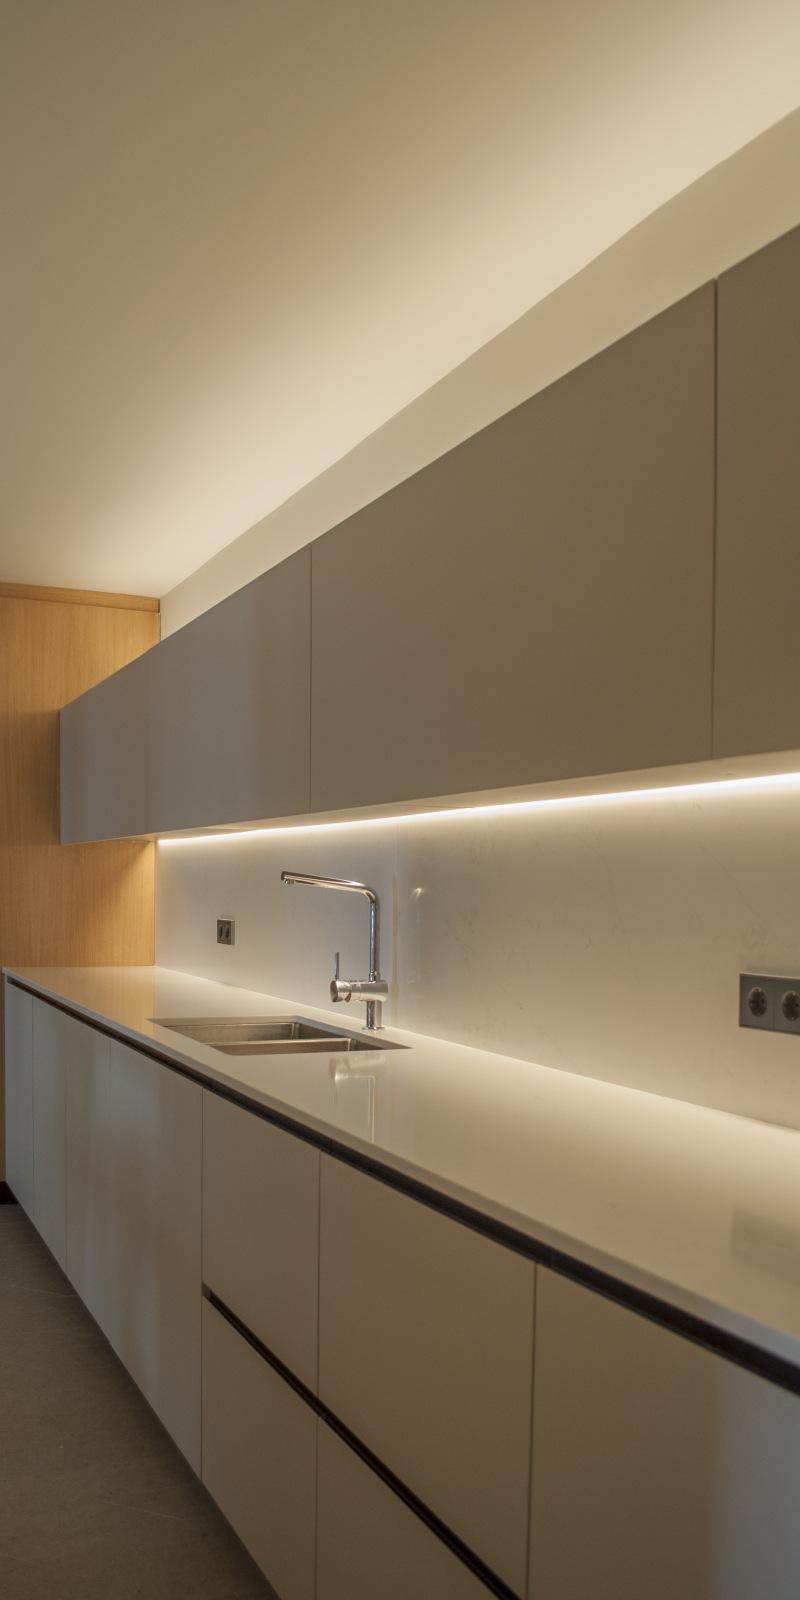 13-arquitectura-sitges-interiorismo-barcelona-cocina-moderna-silestone-led-madera-